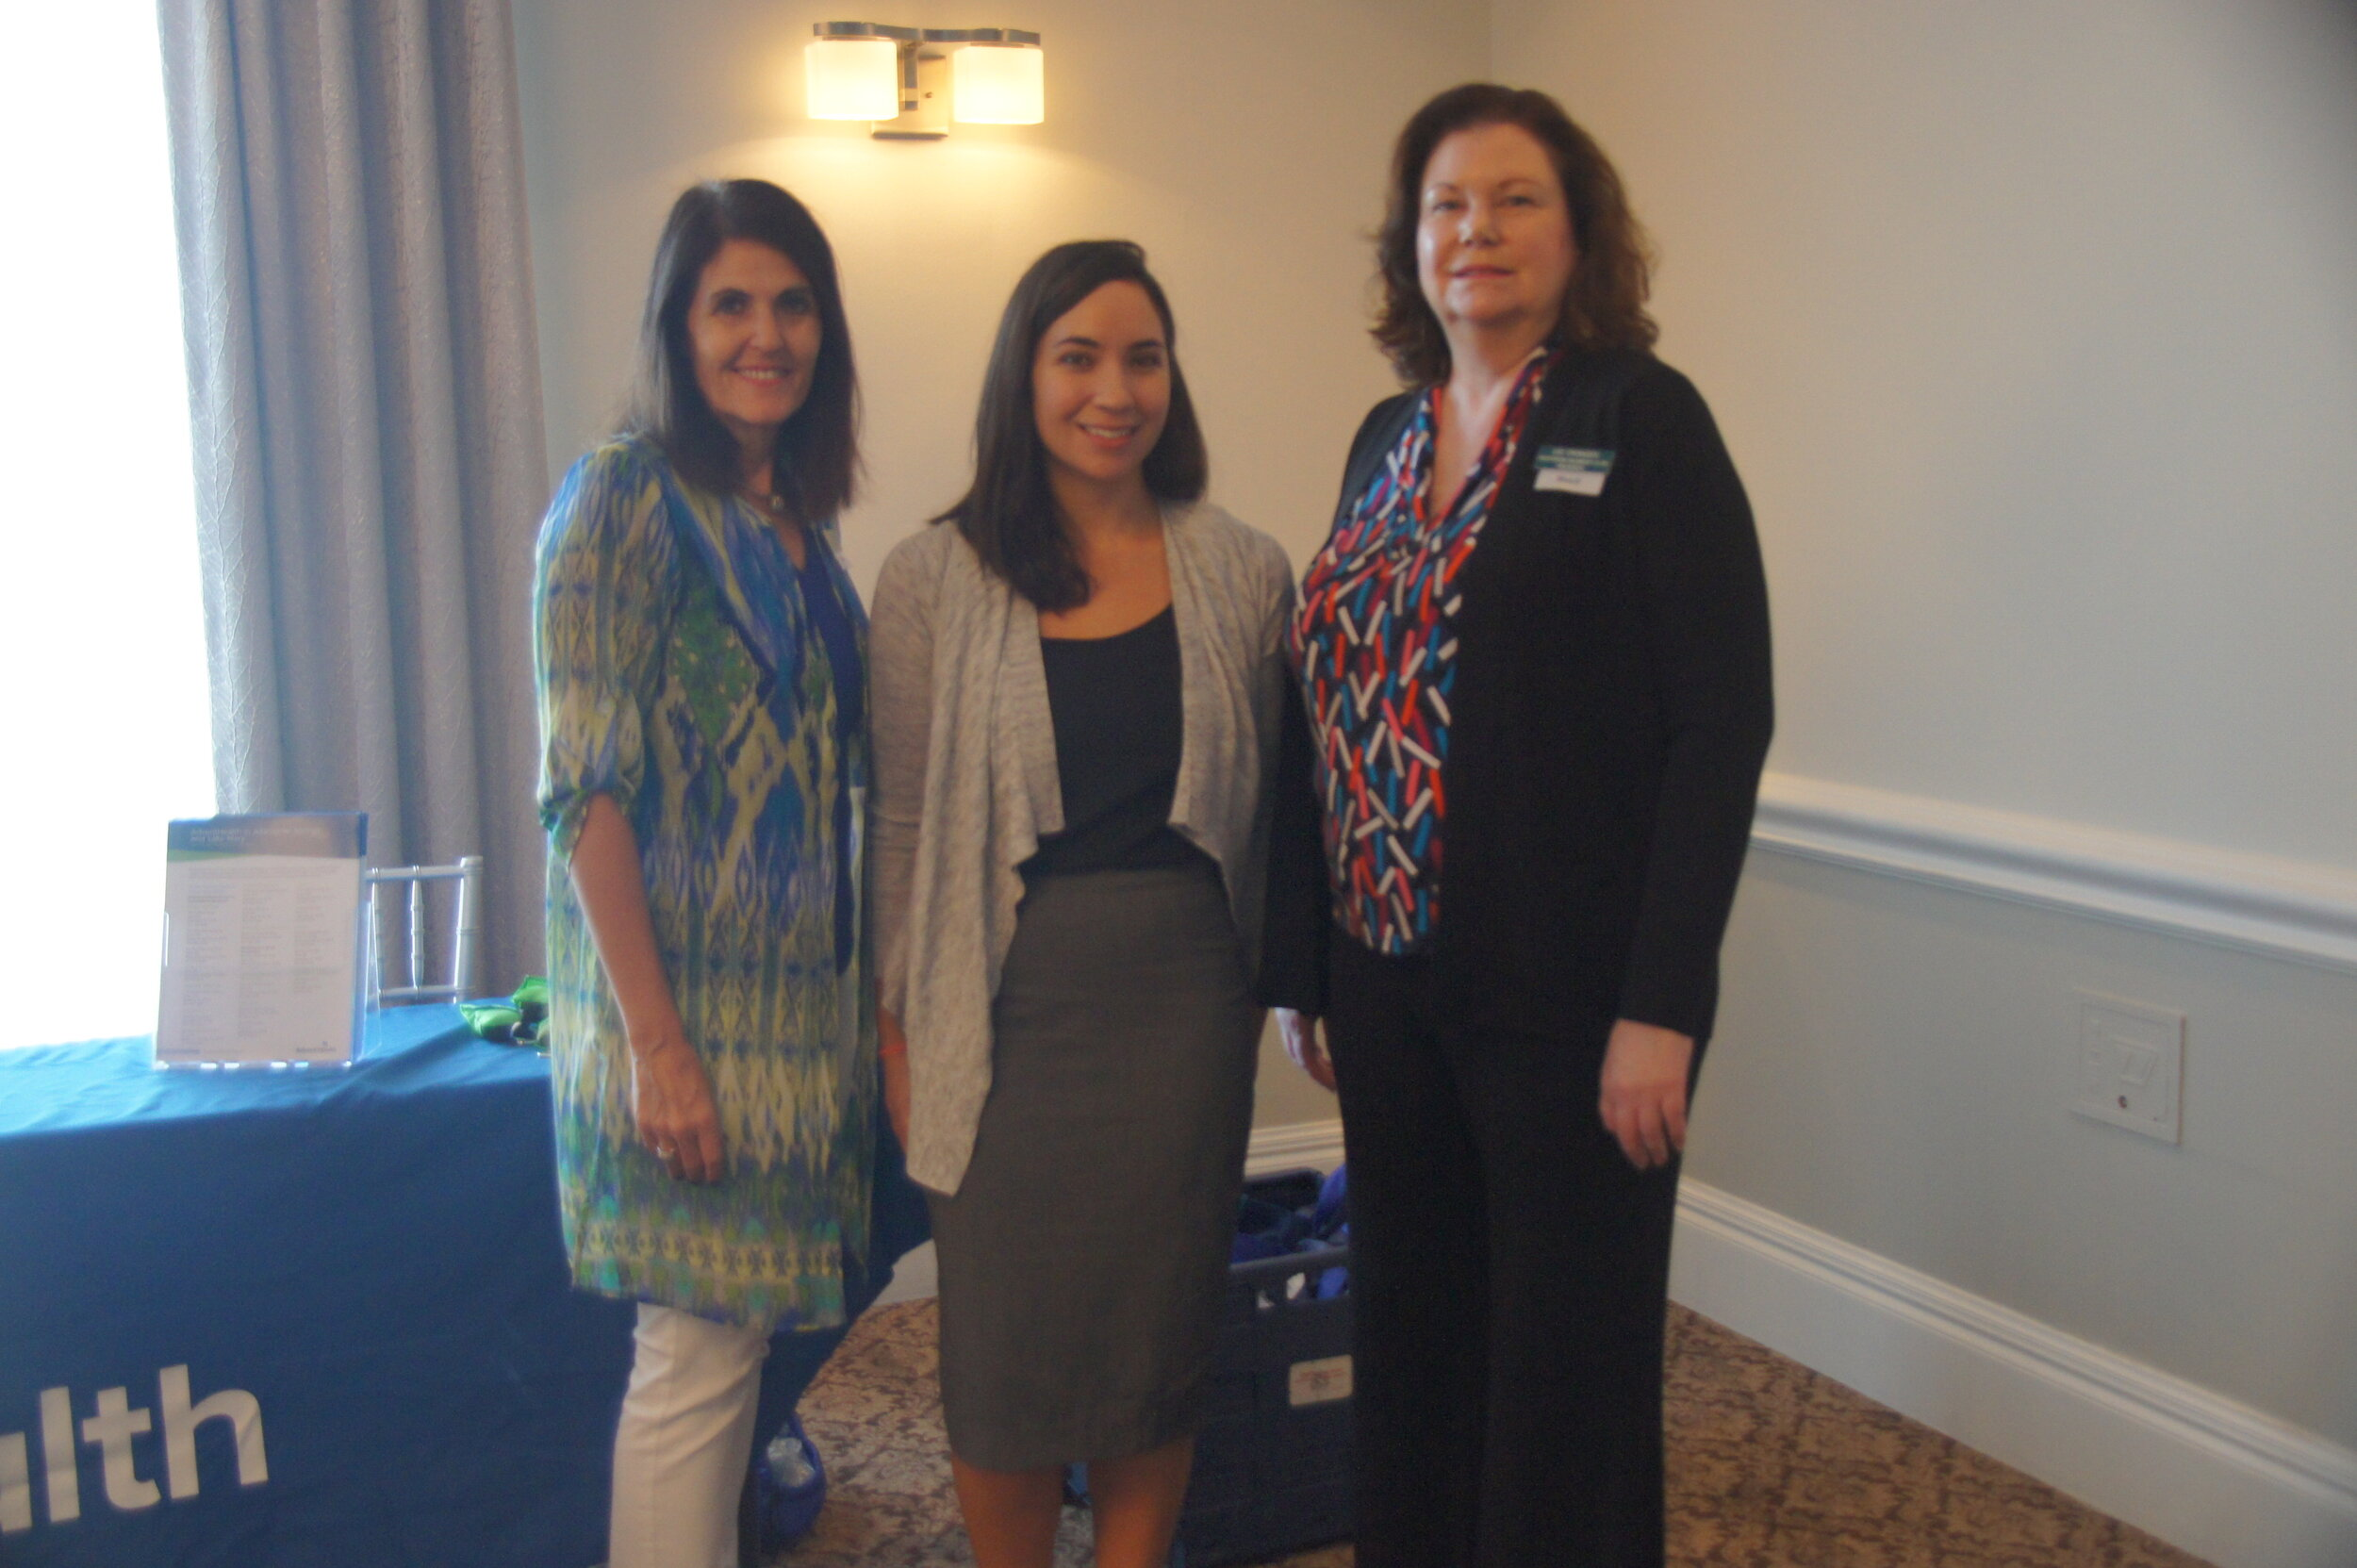 Becki Miller, Katherine GUtierrez, Lee Granger.JPG